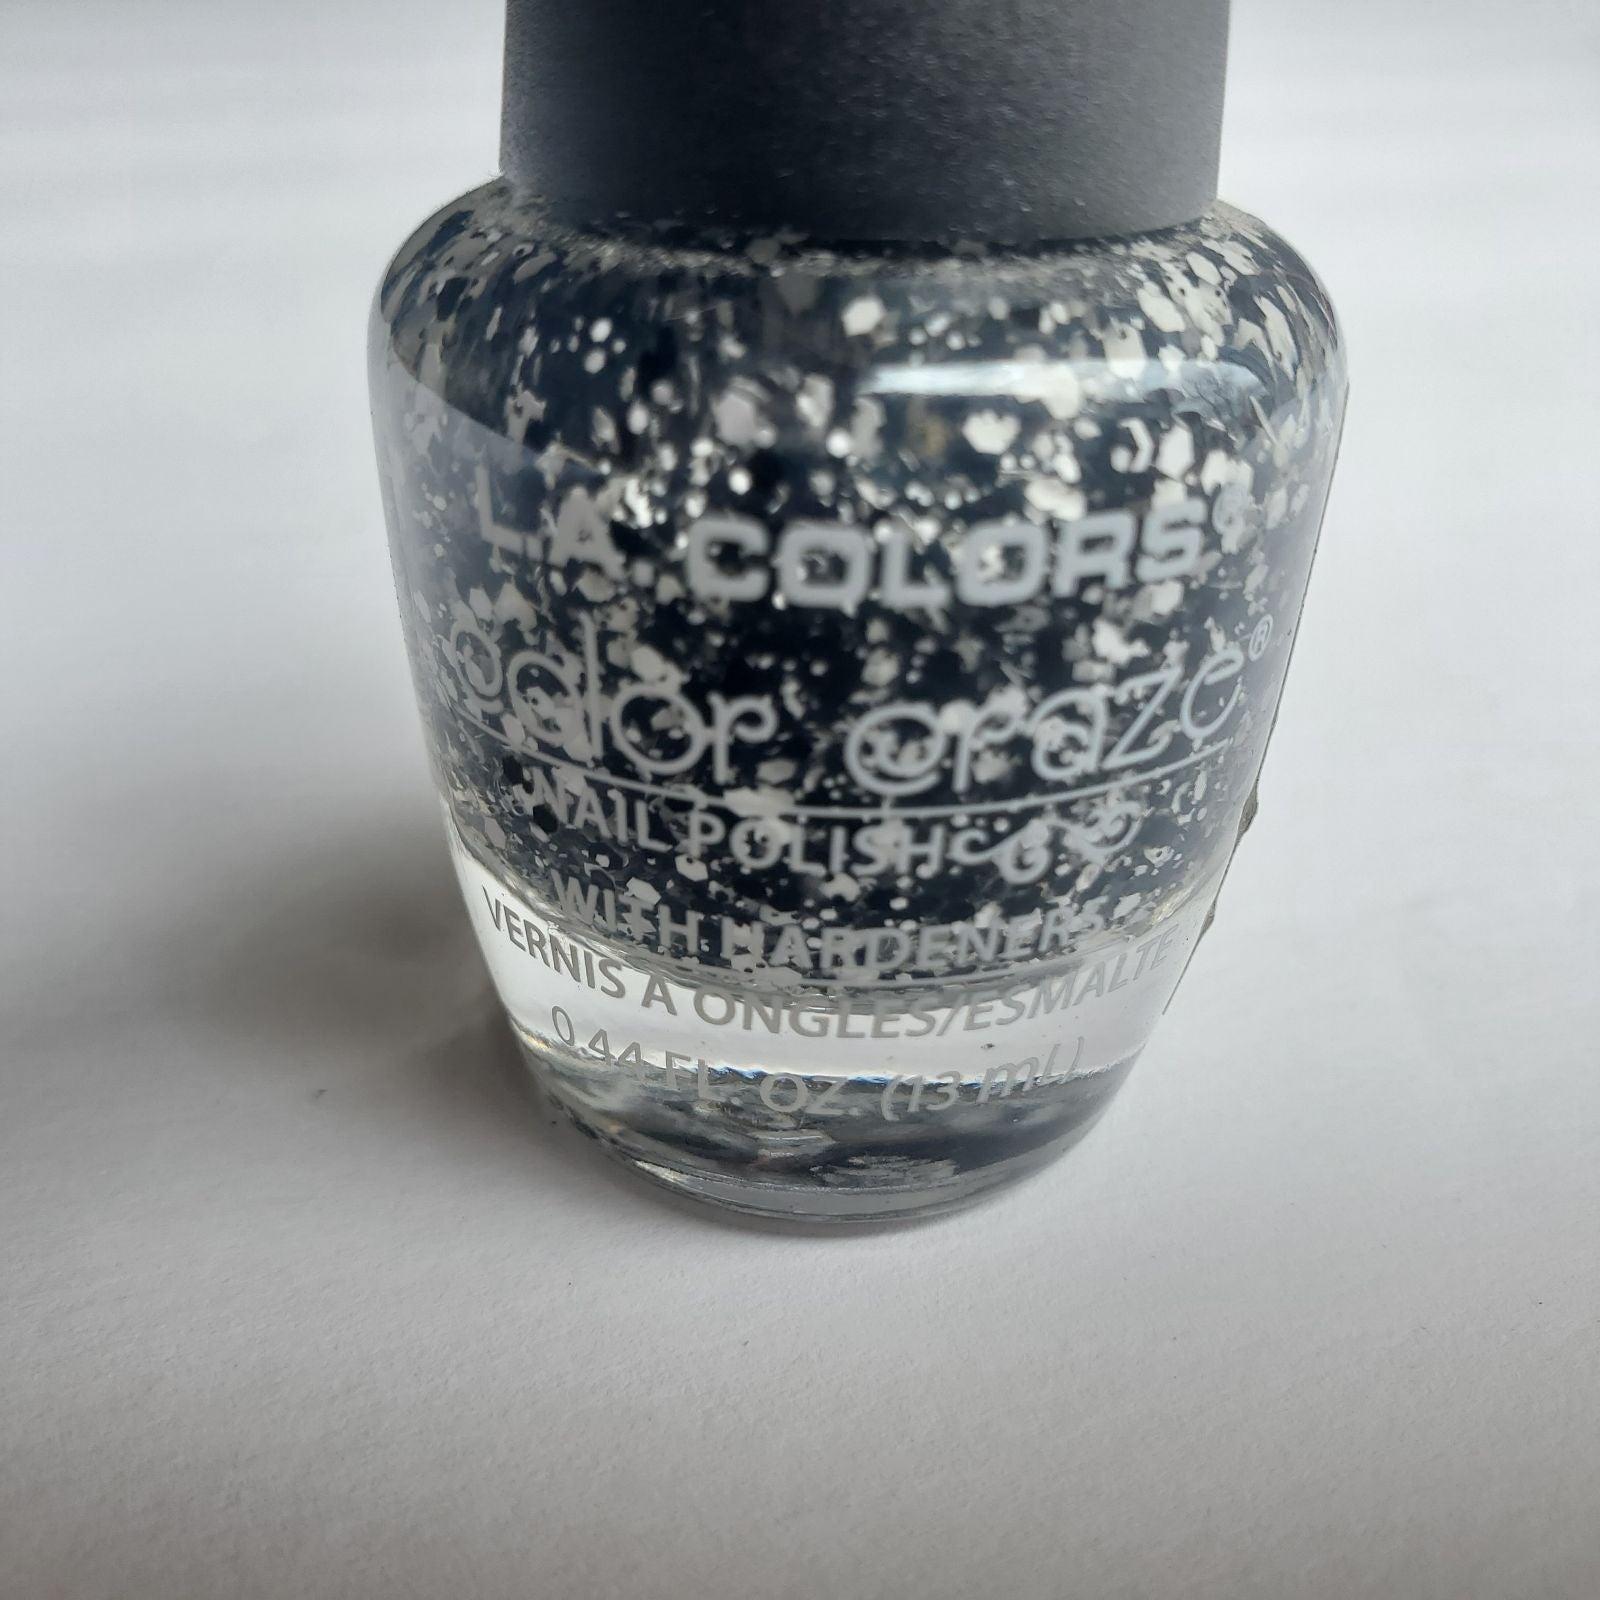 LA Colors Splat! Black and white glitter